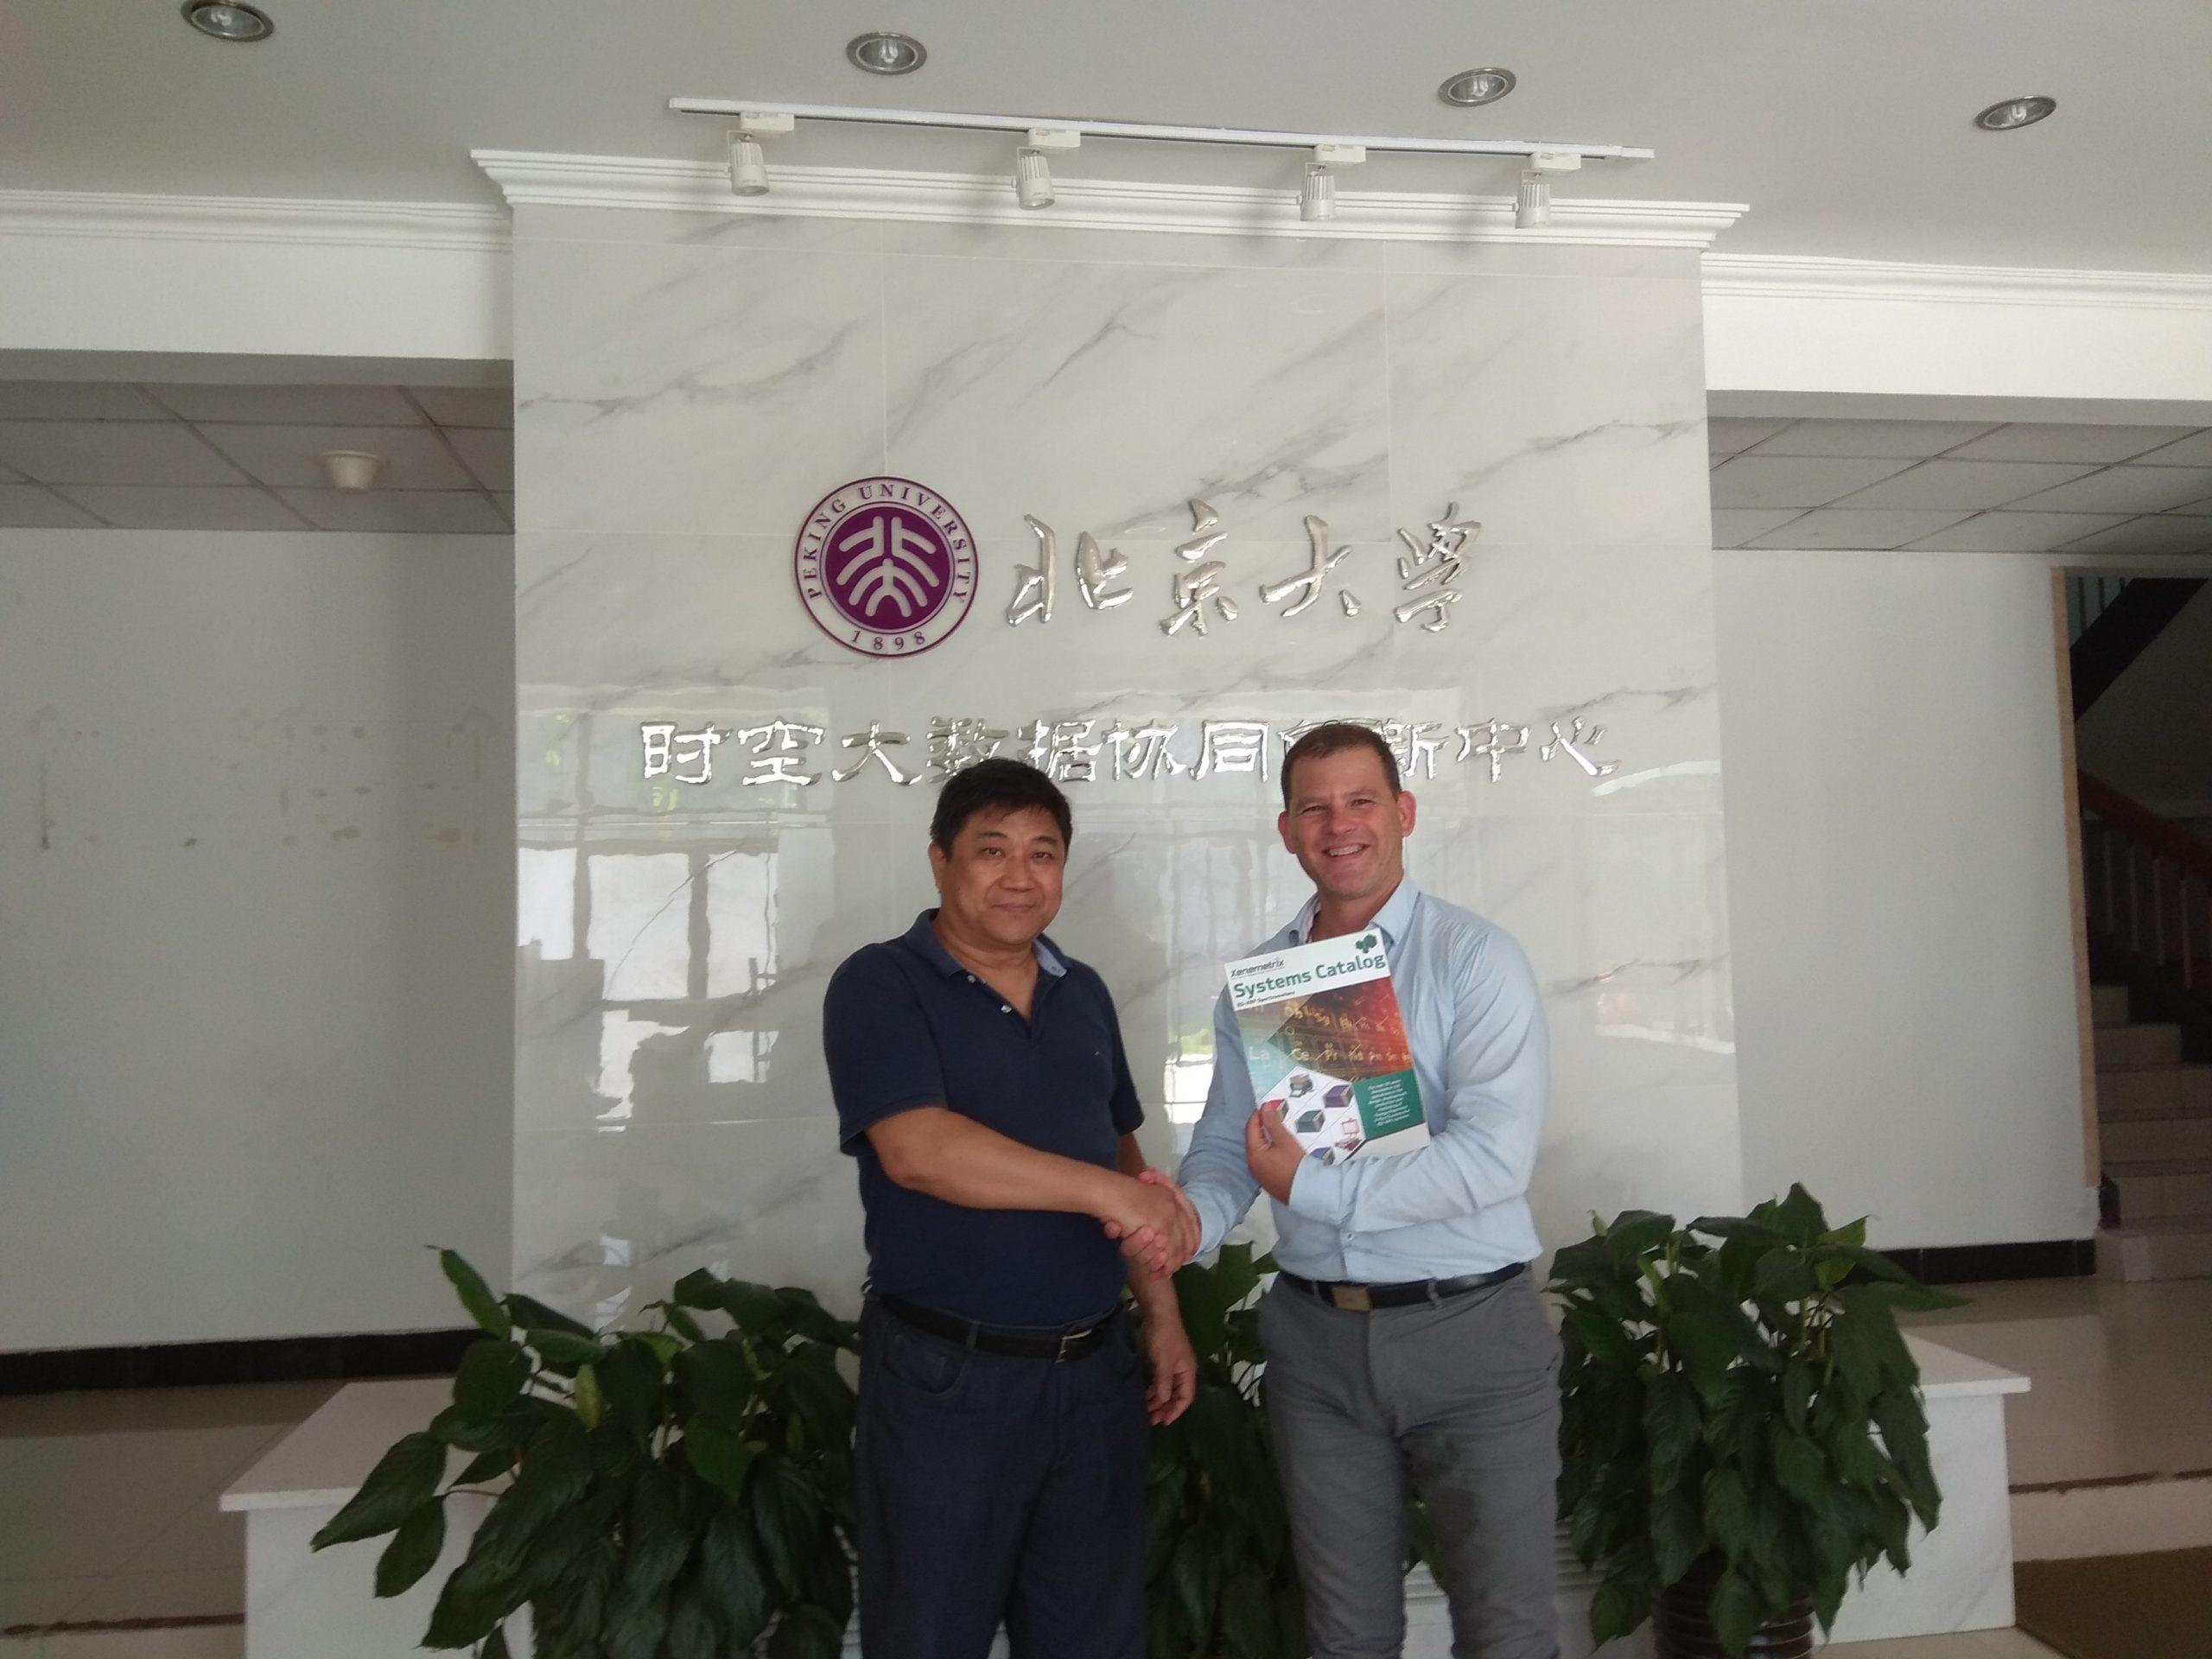 IMG_20190712_ Beijing University Prof Lu